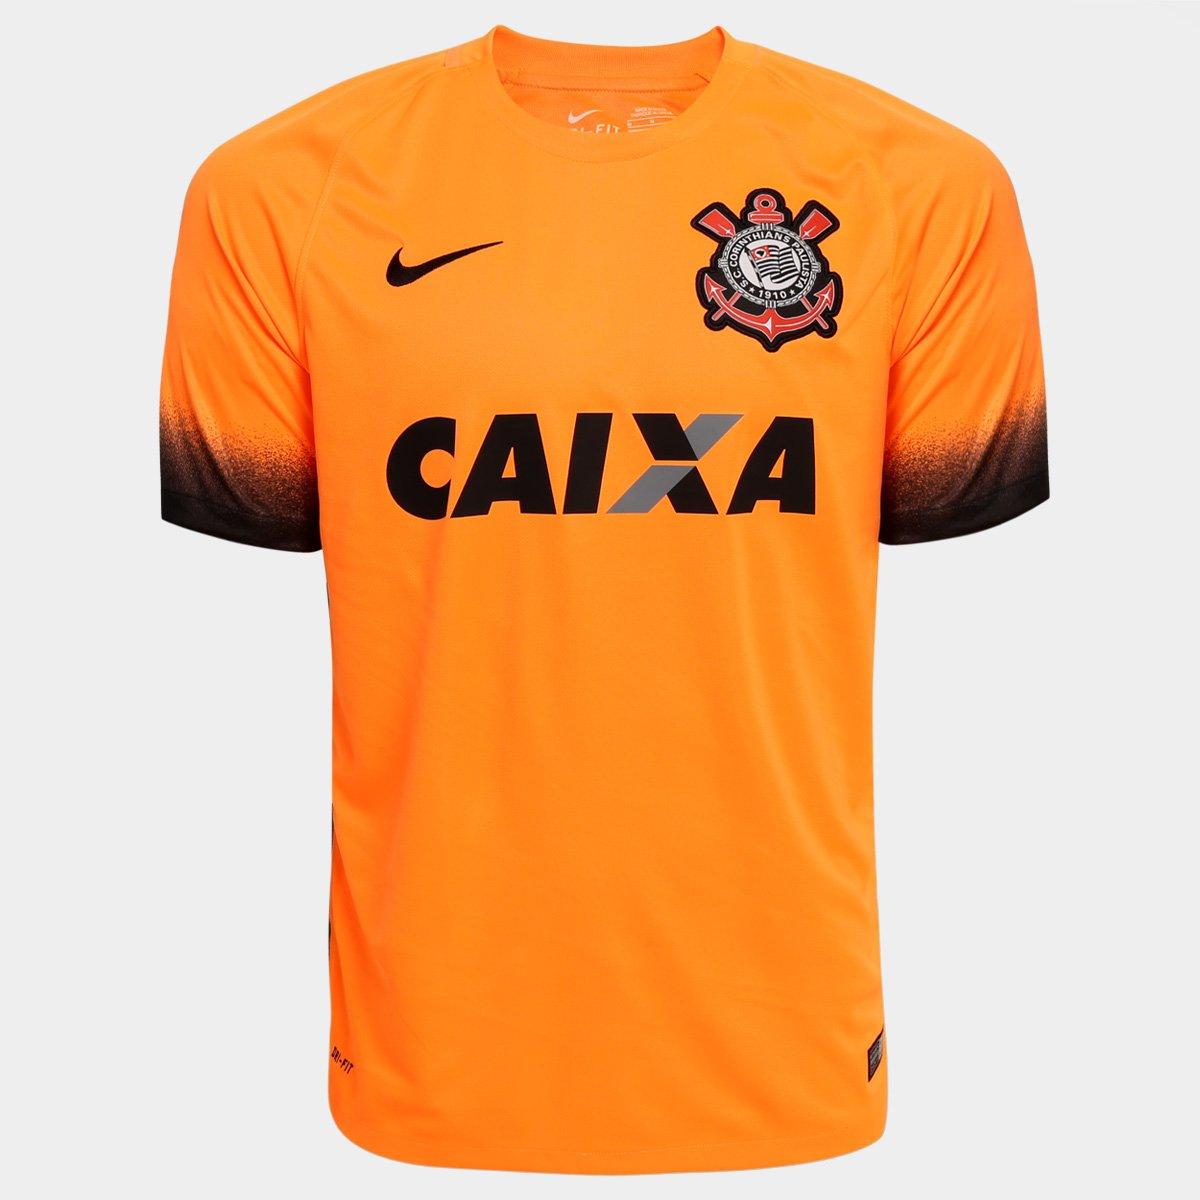 Camisa Corinthians III 15 16 s nº - Torcedor Nike Masculina - Compre ... ab2994243ba25